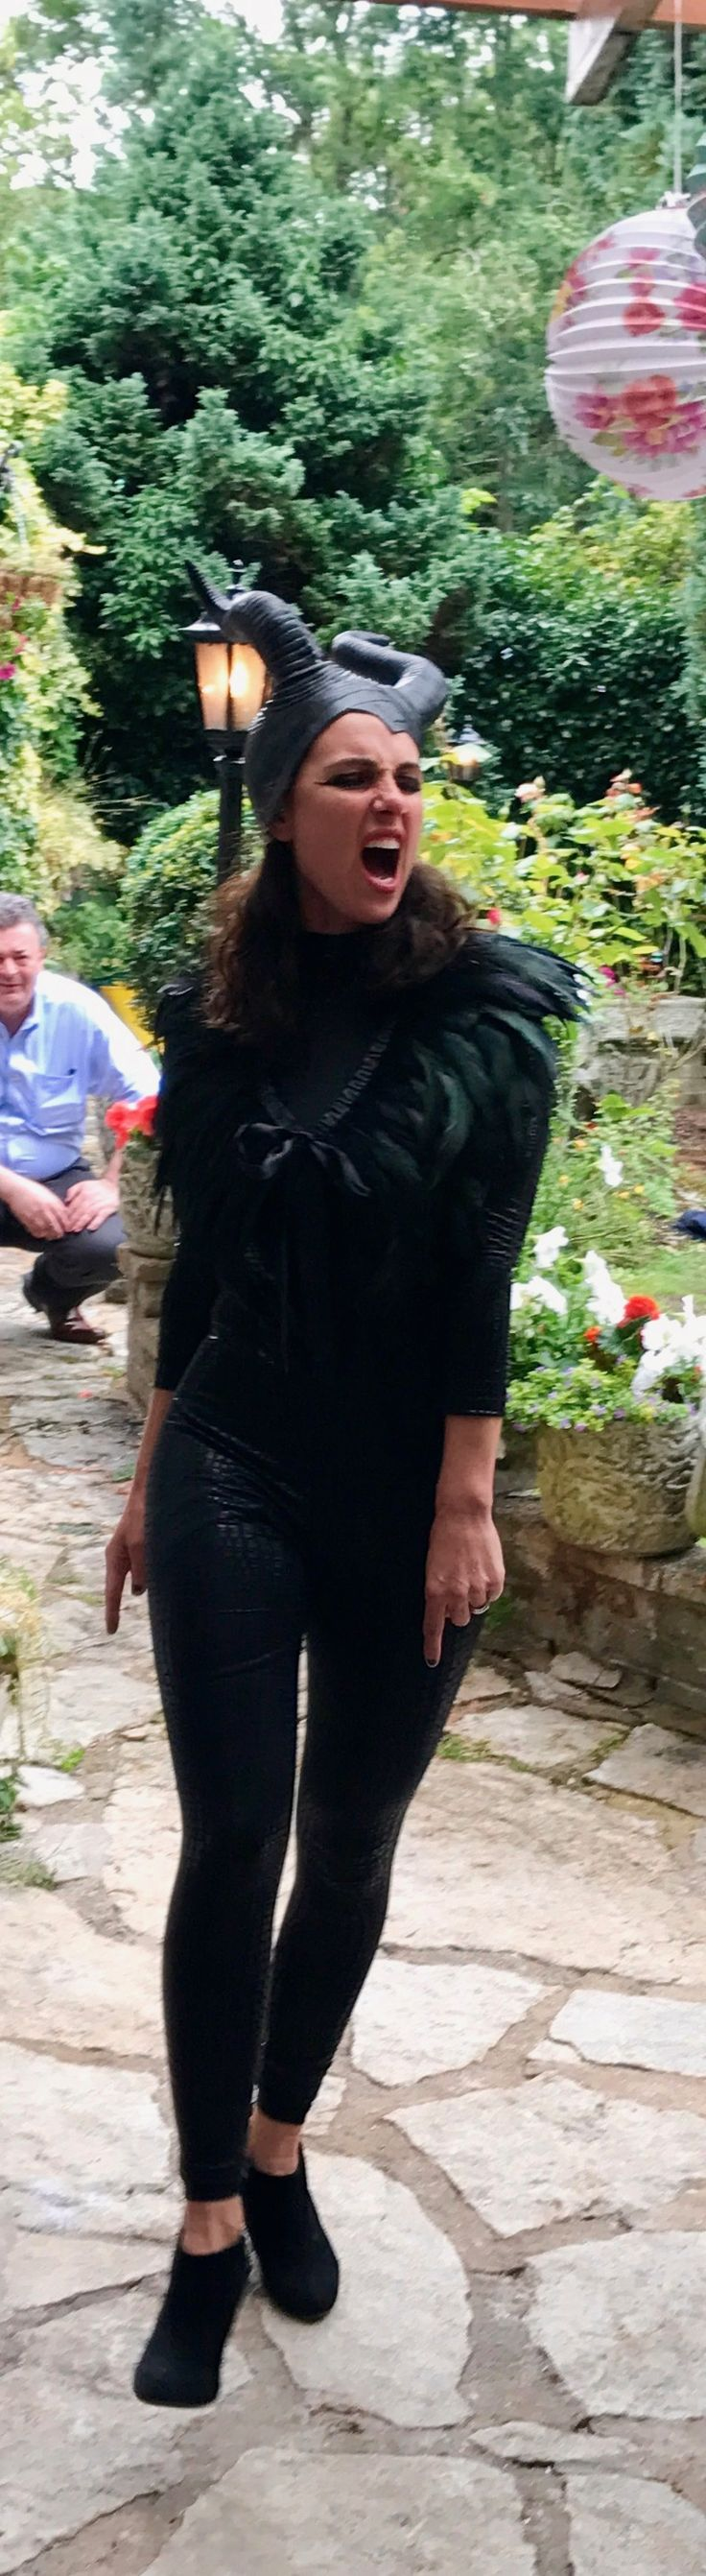 Aleksandra King in Leather Maleficent costume